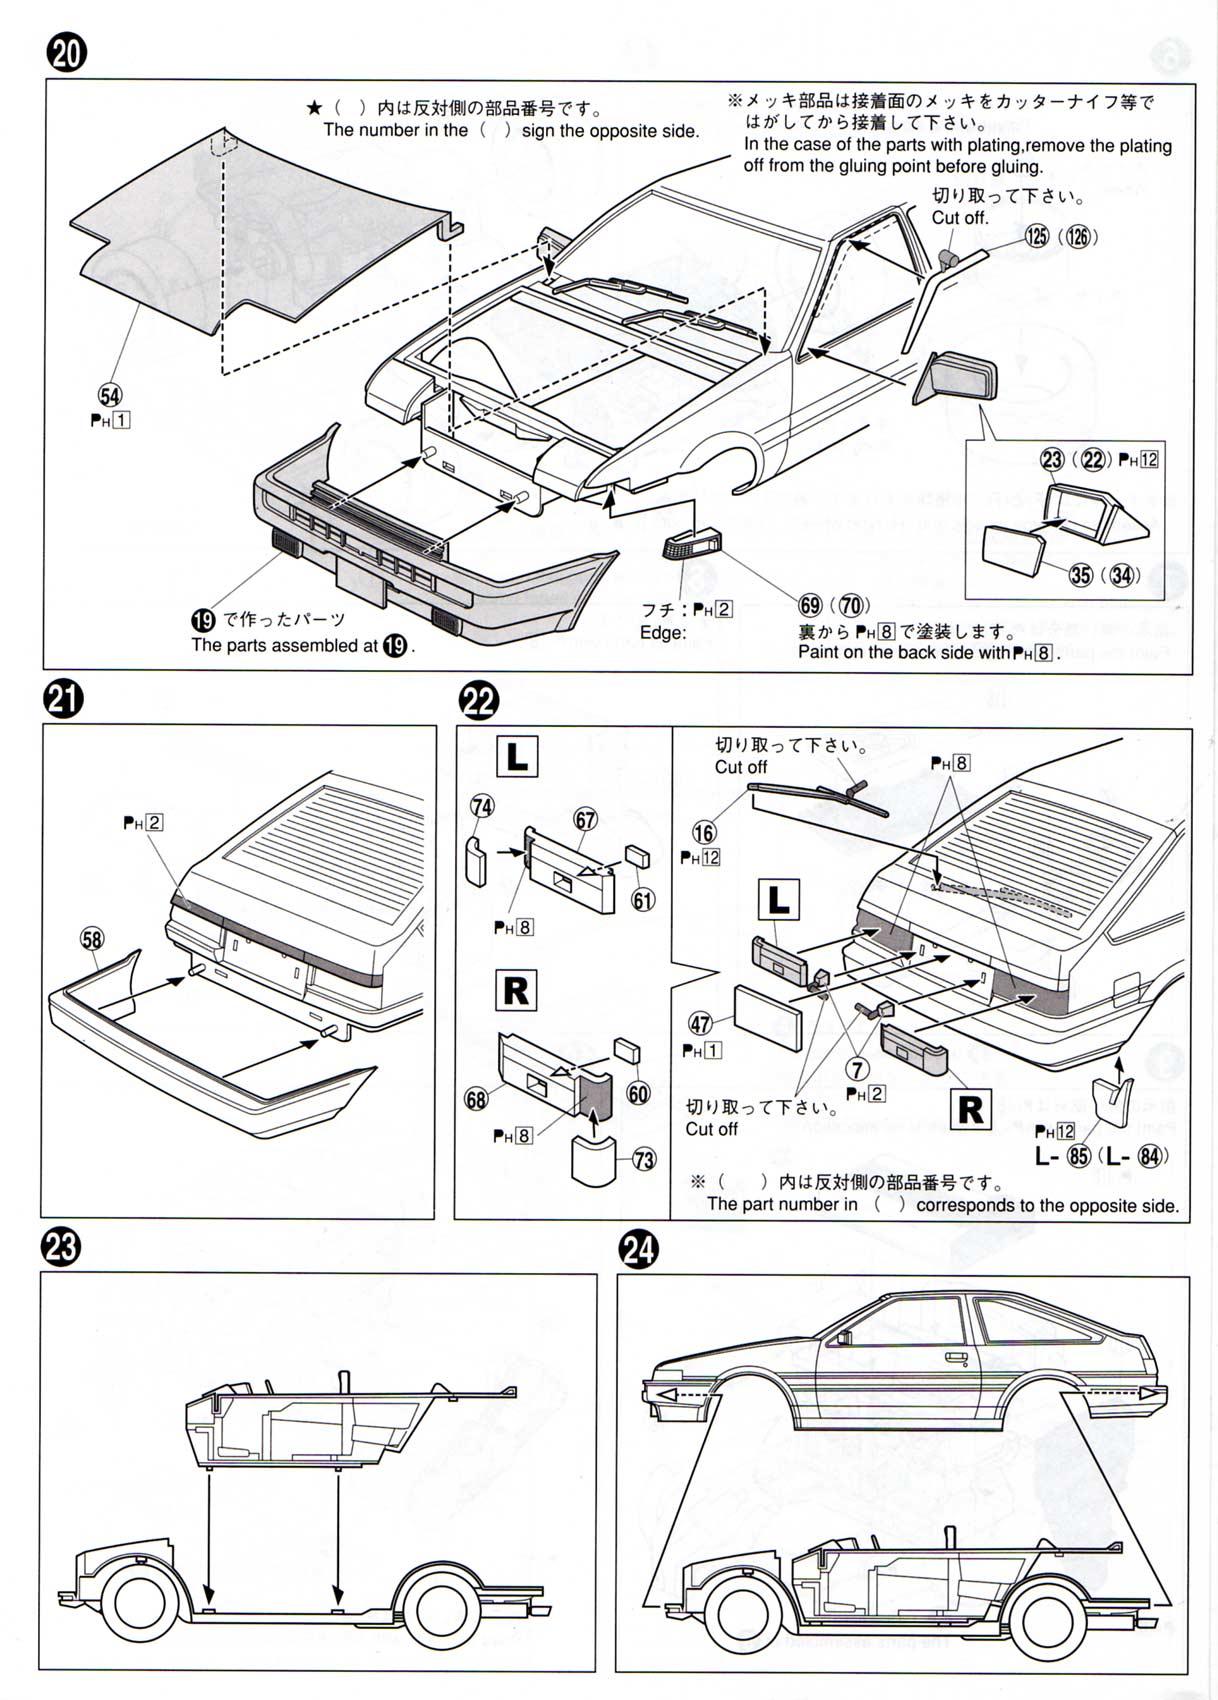 Plan de montage de la Toyota Trueno AE 86 d'Initial D - ech 1/24 (Aoshima) - Page 9